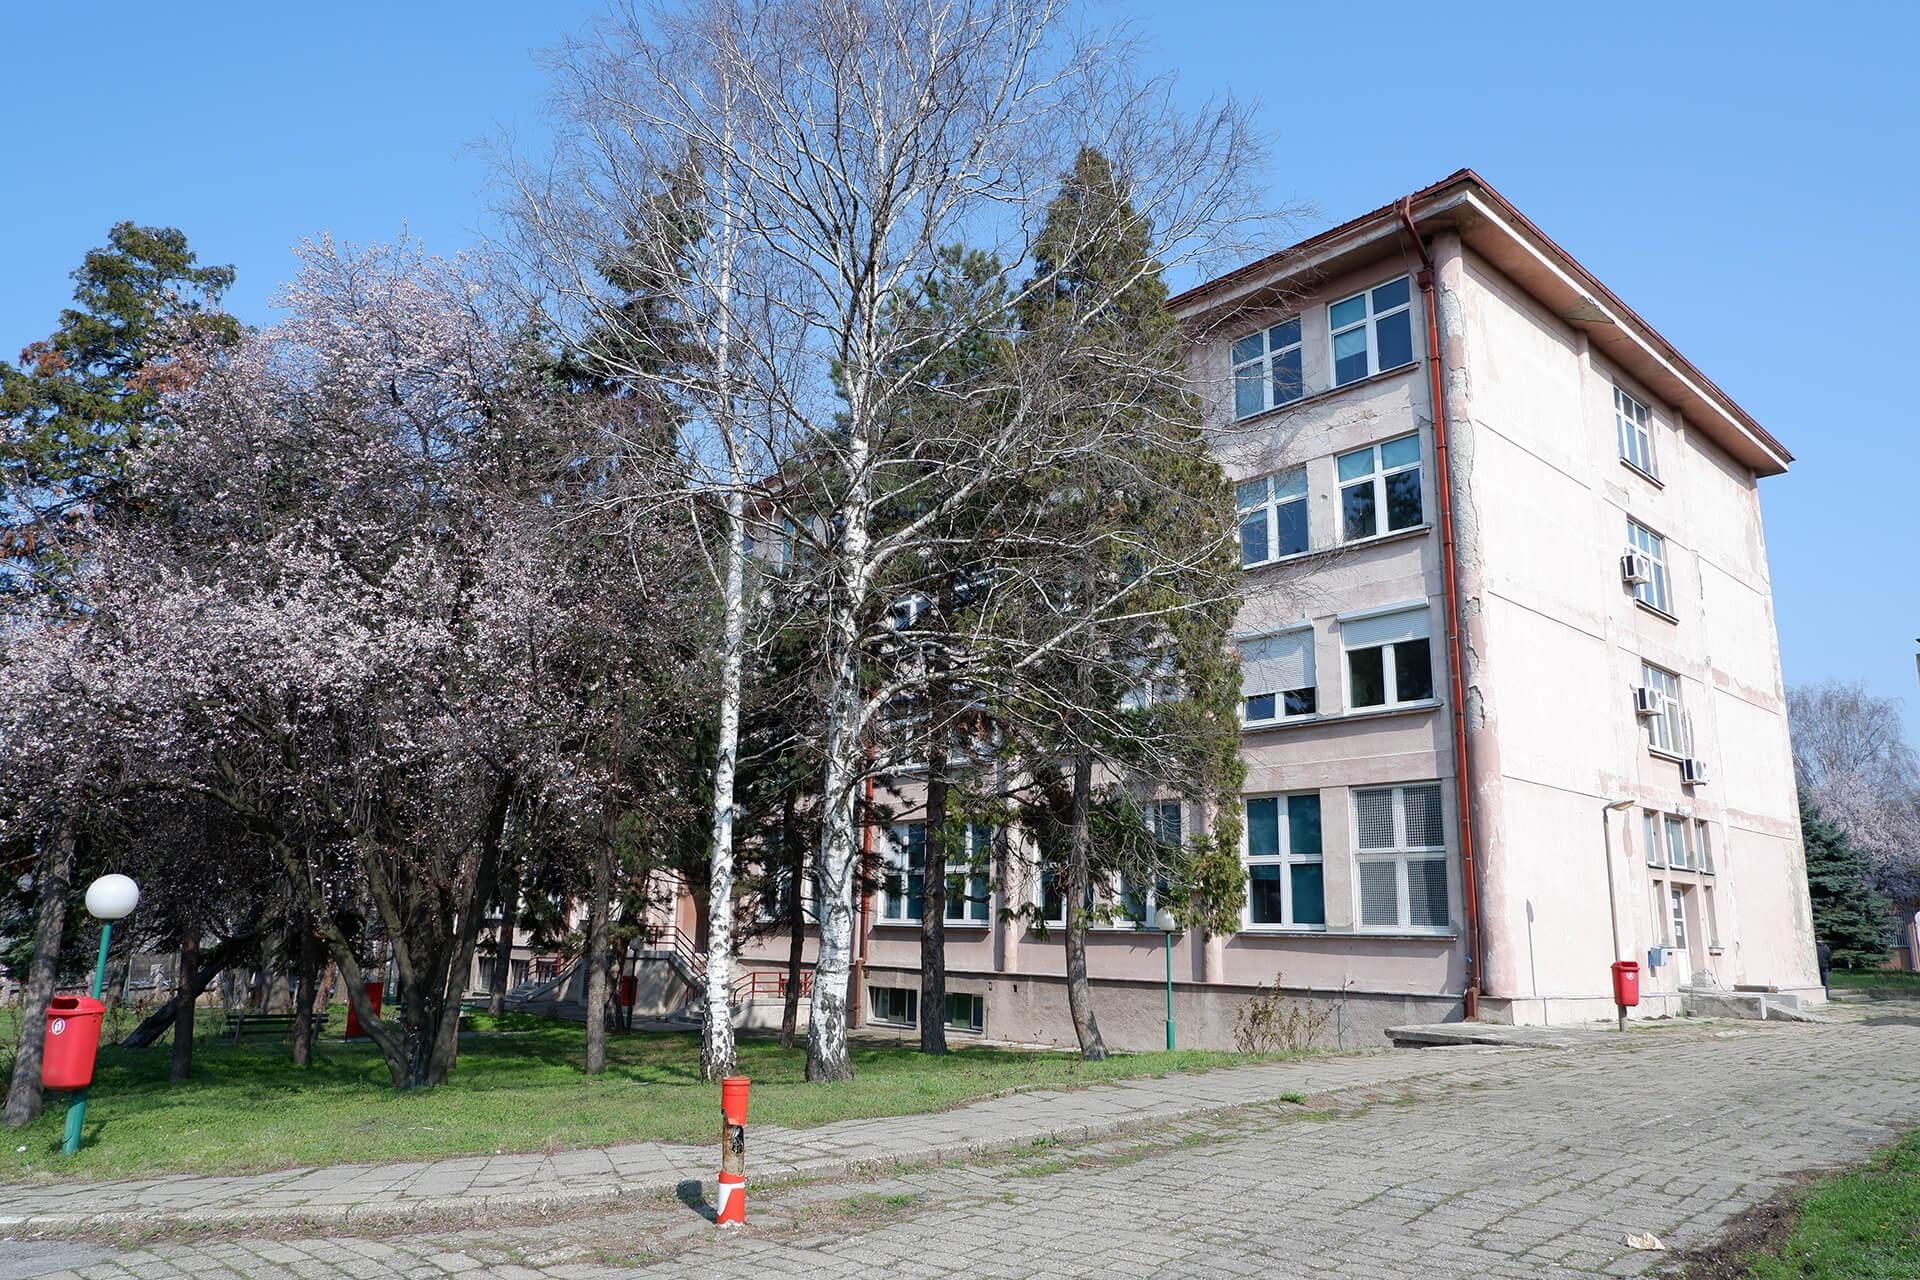 Vojnomedicinski Centar Karaburma Cvmu Beograd